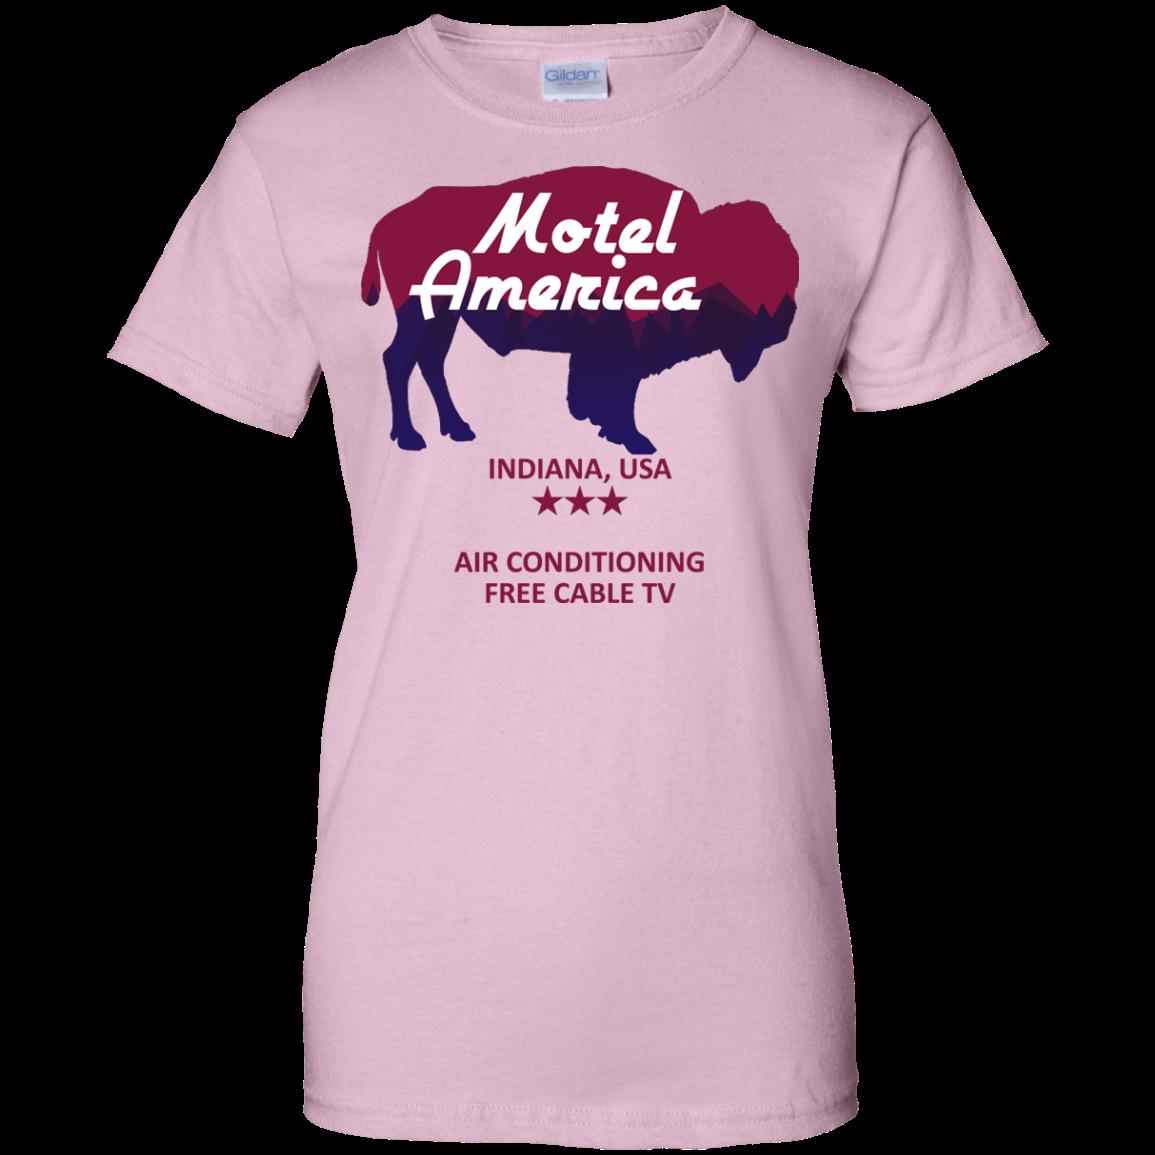 image 388px Motel America, Indiana USA Shirt Home of the Gods T Shirts